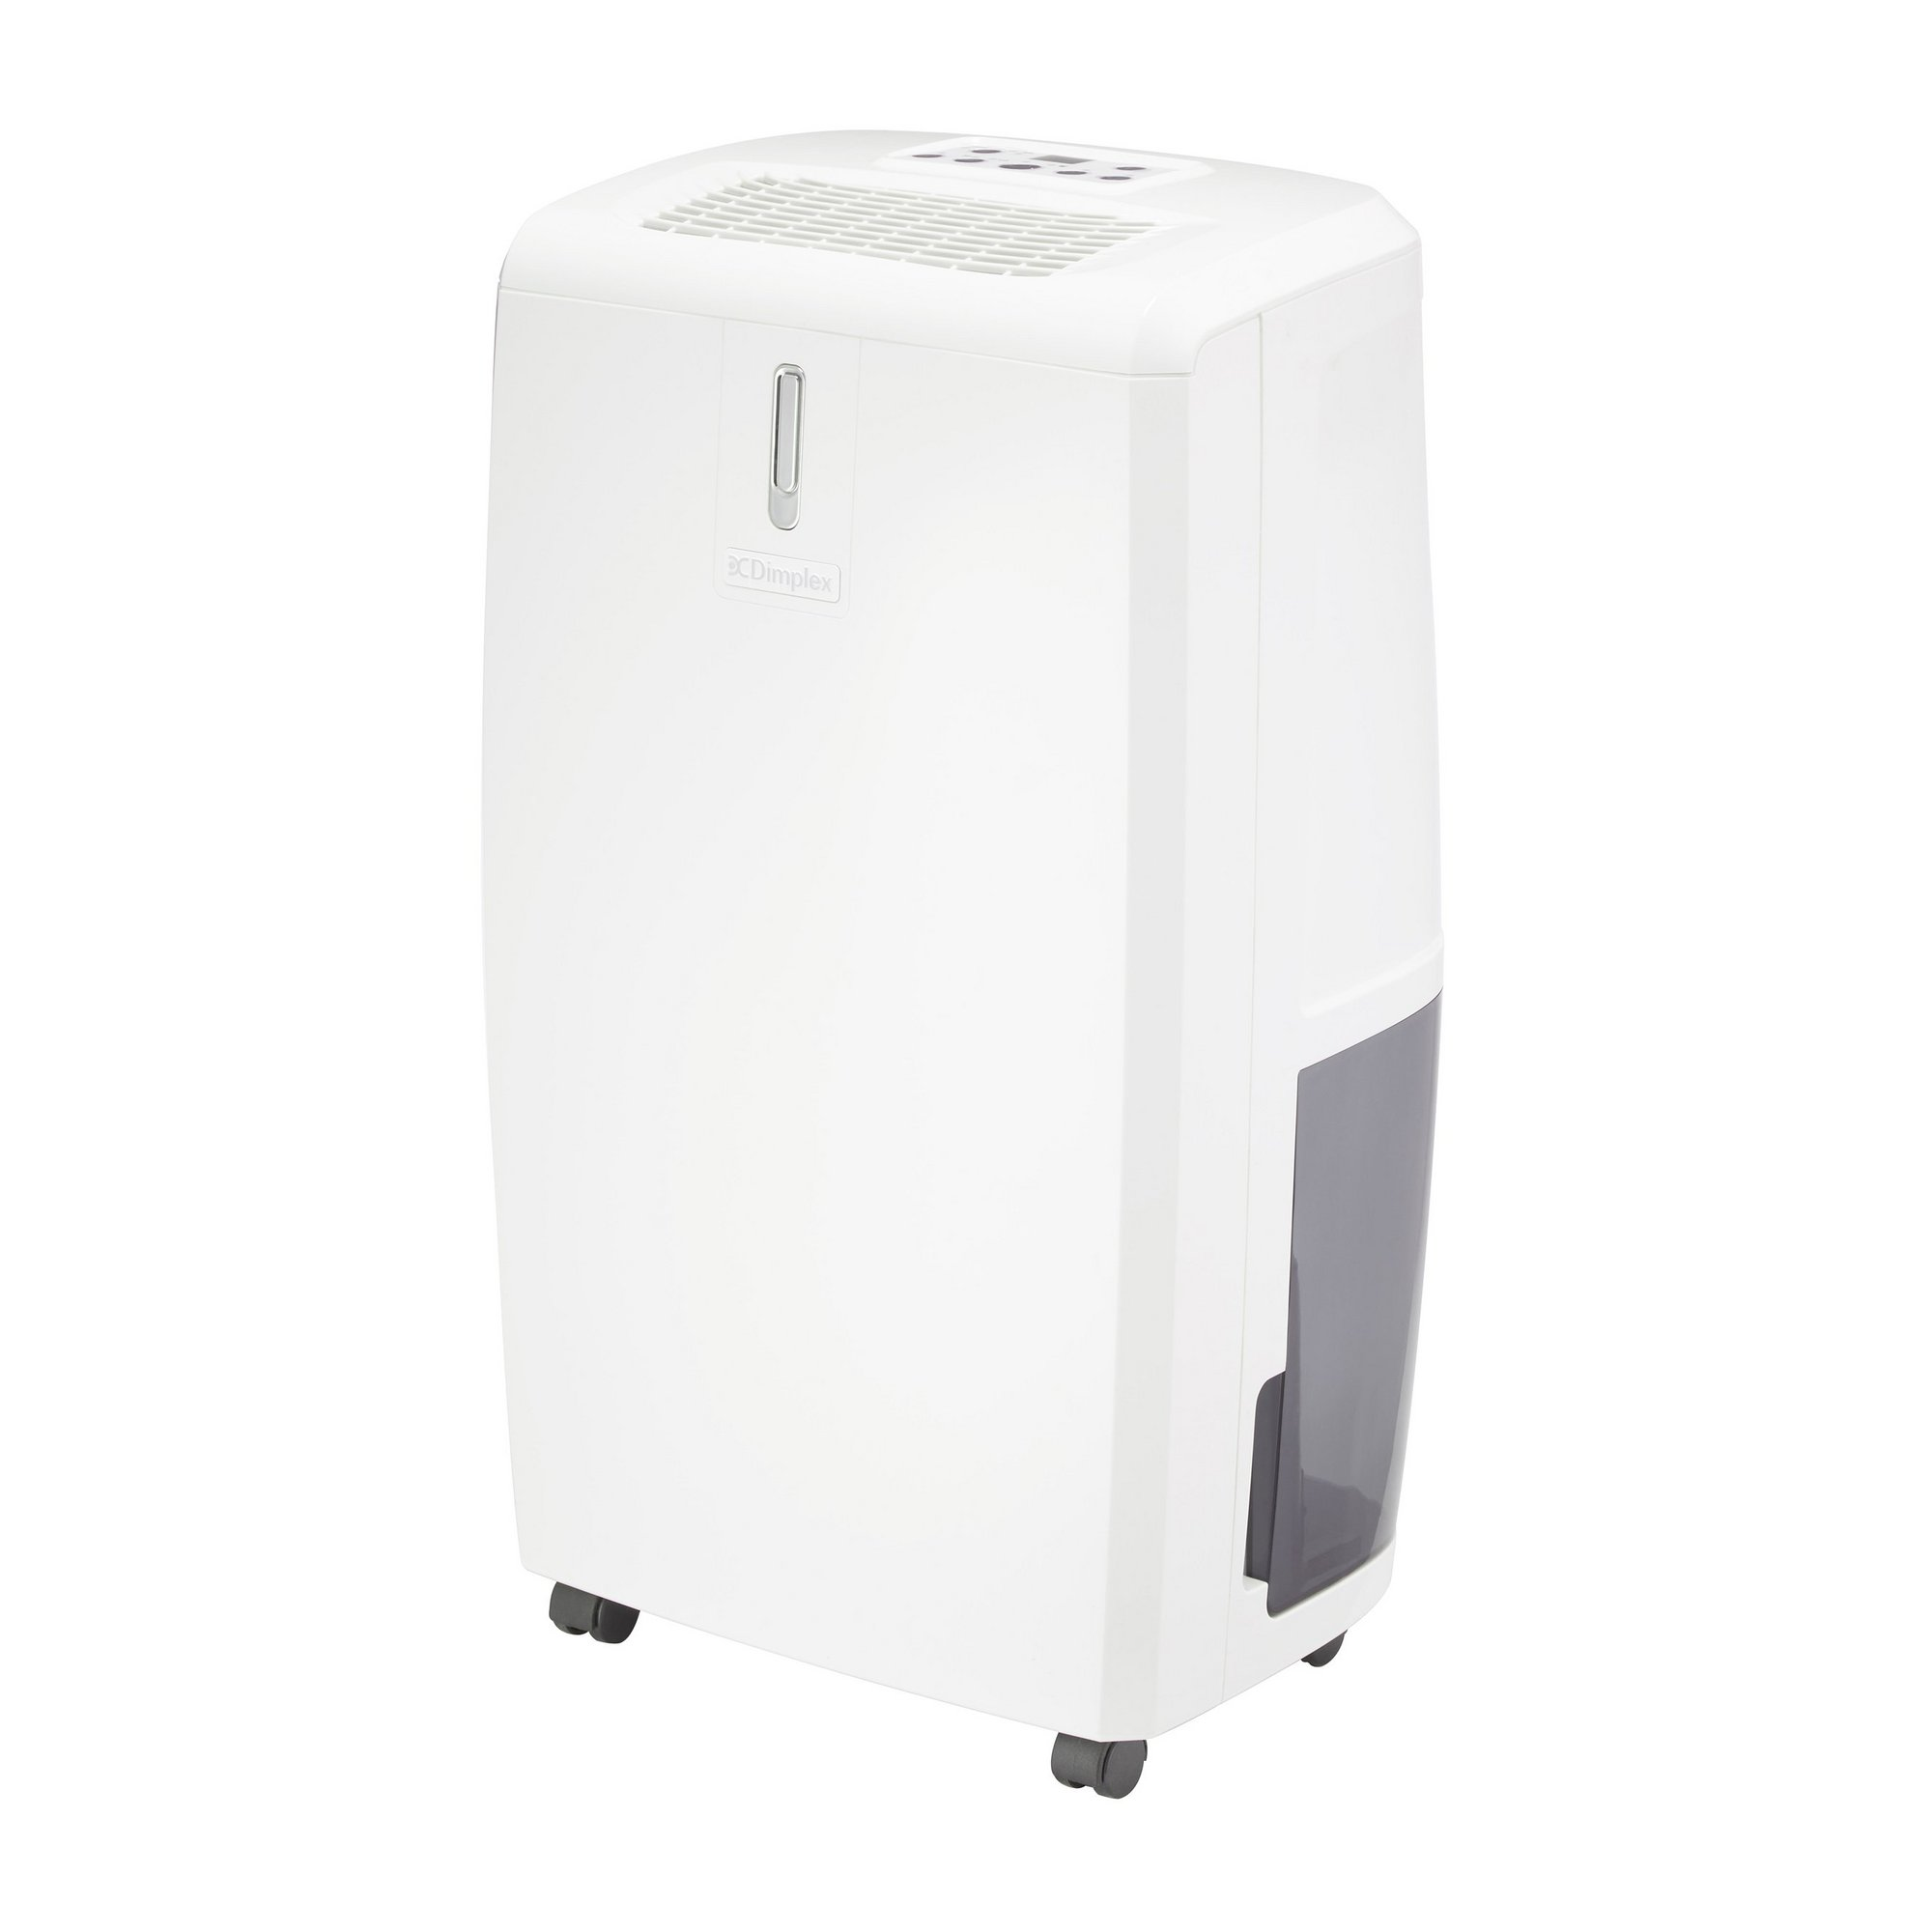 Image of Dimplex Everdri 20 Litre Dehumidifier